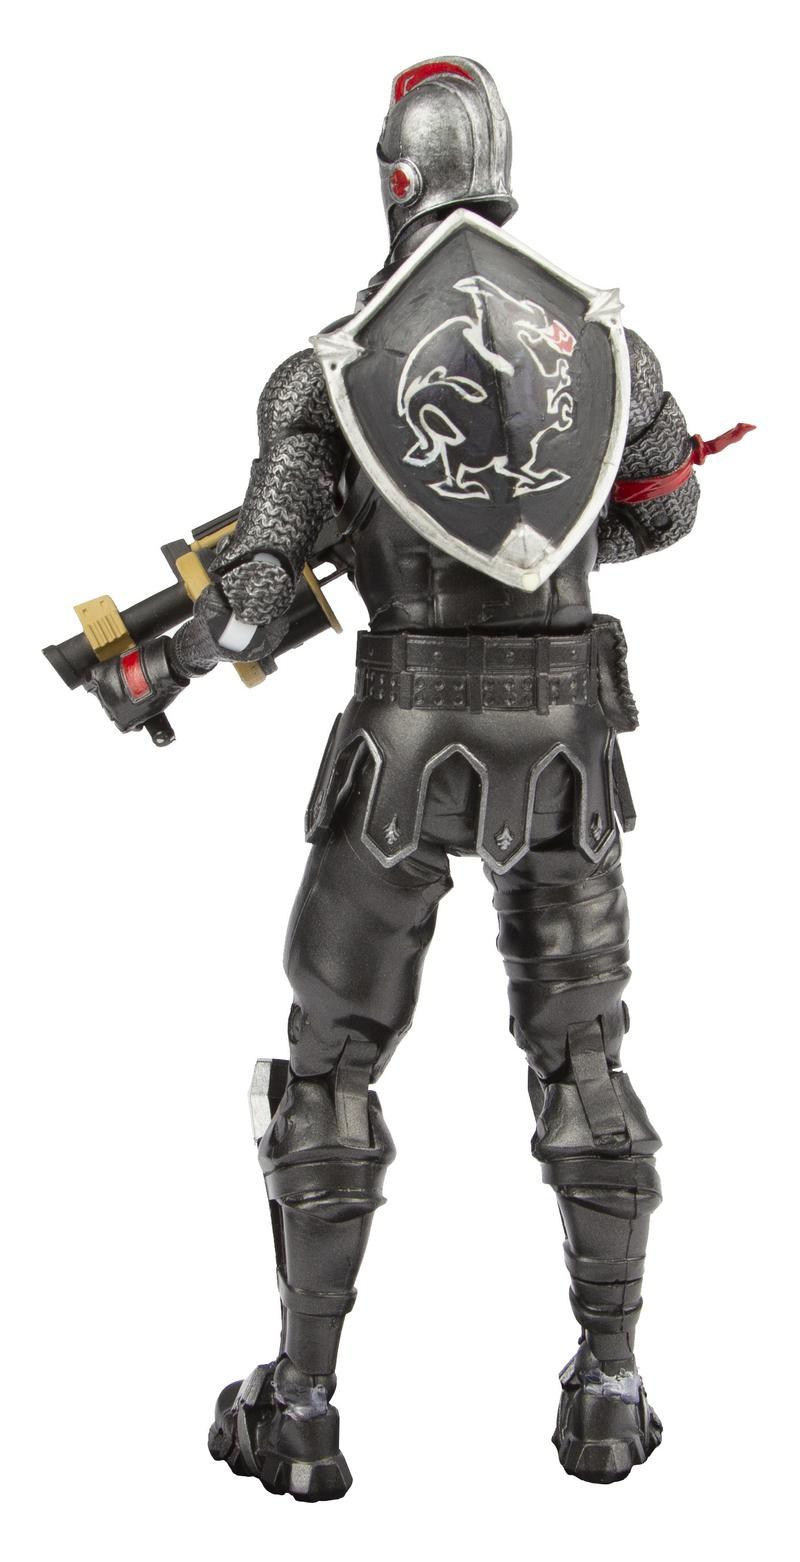 Fortnite Black Knight 7 Action Figure Gamestop